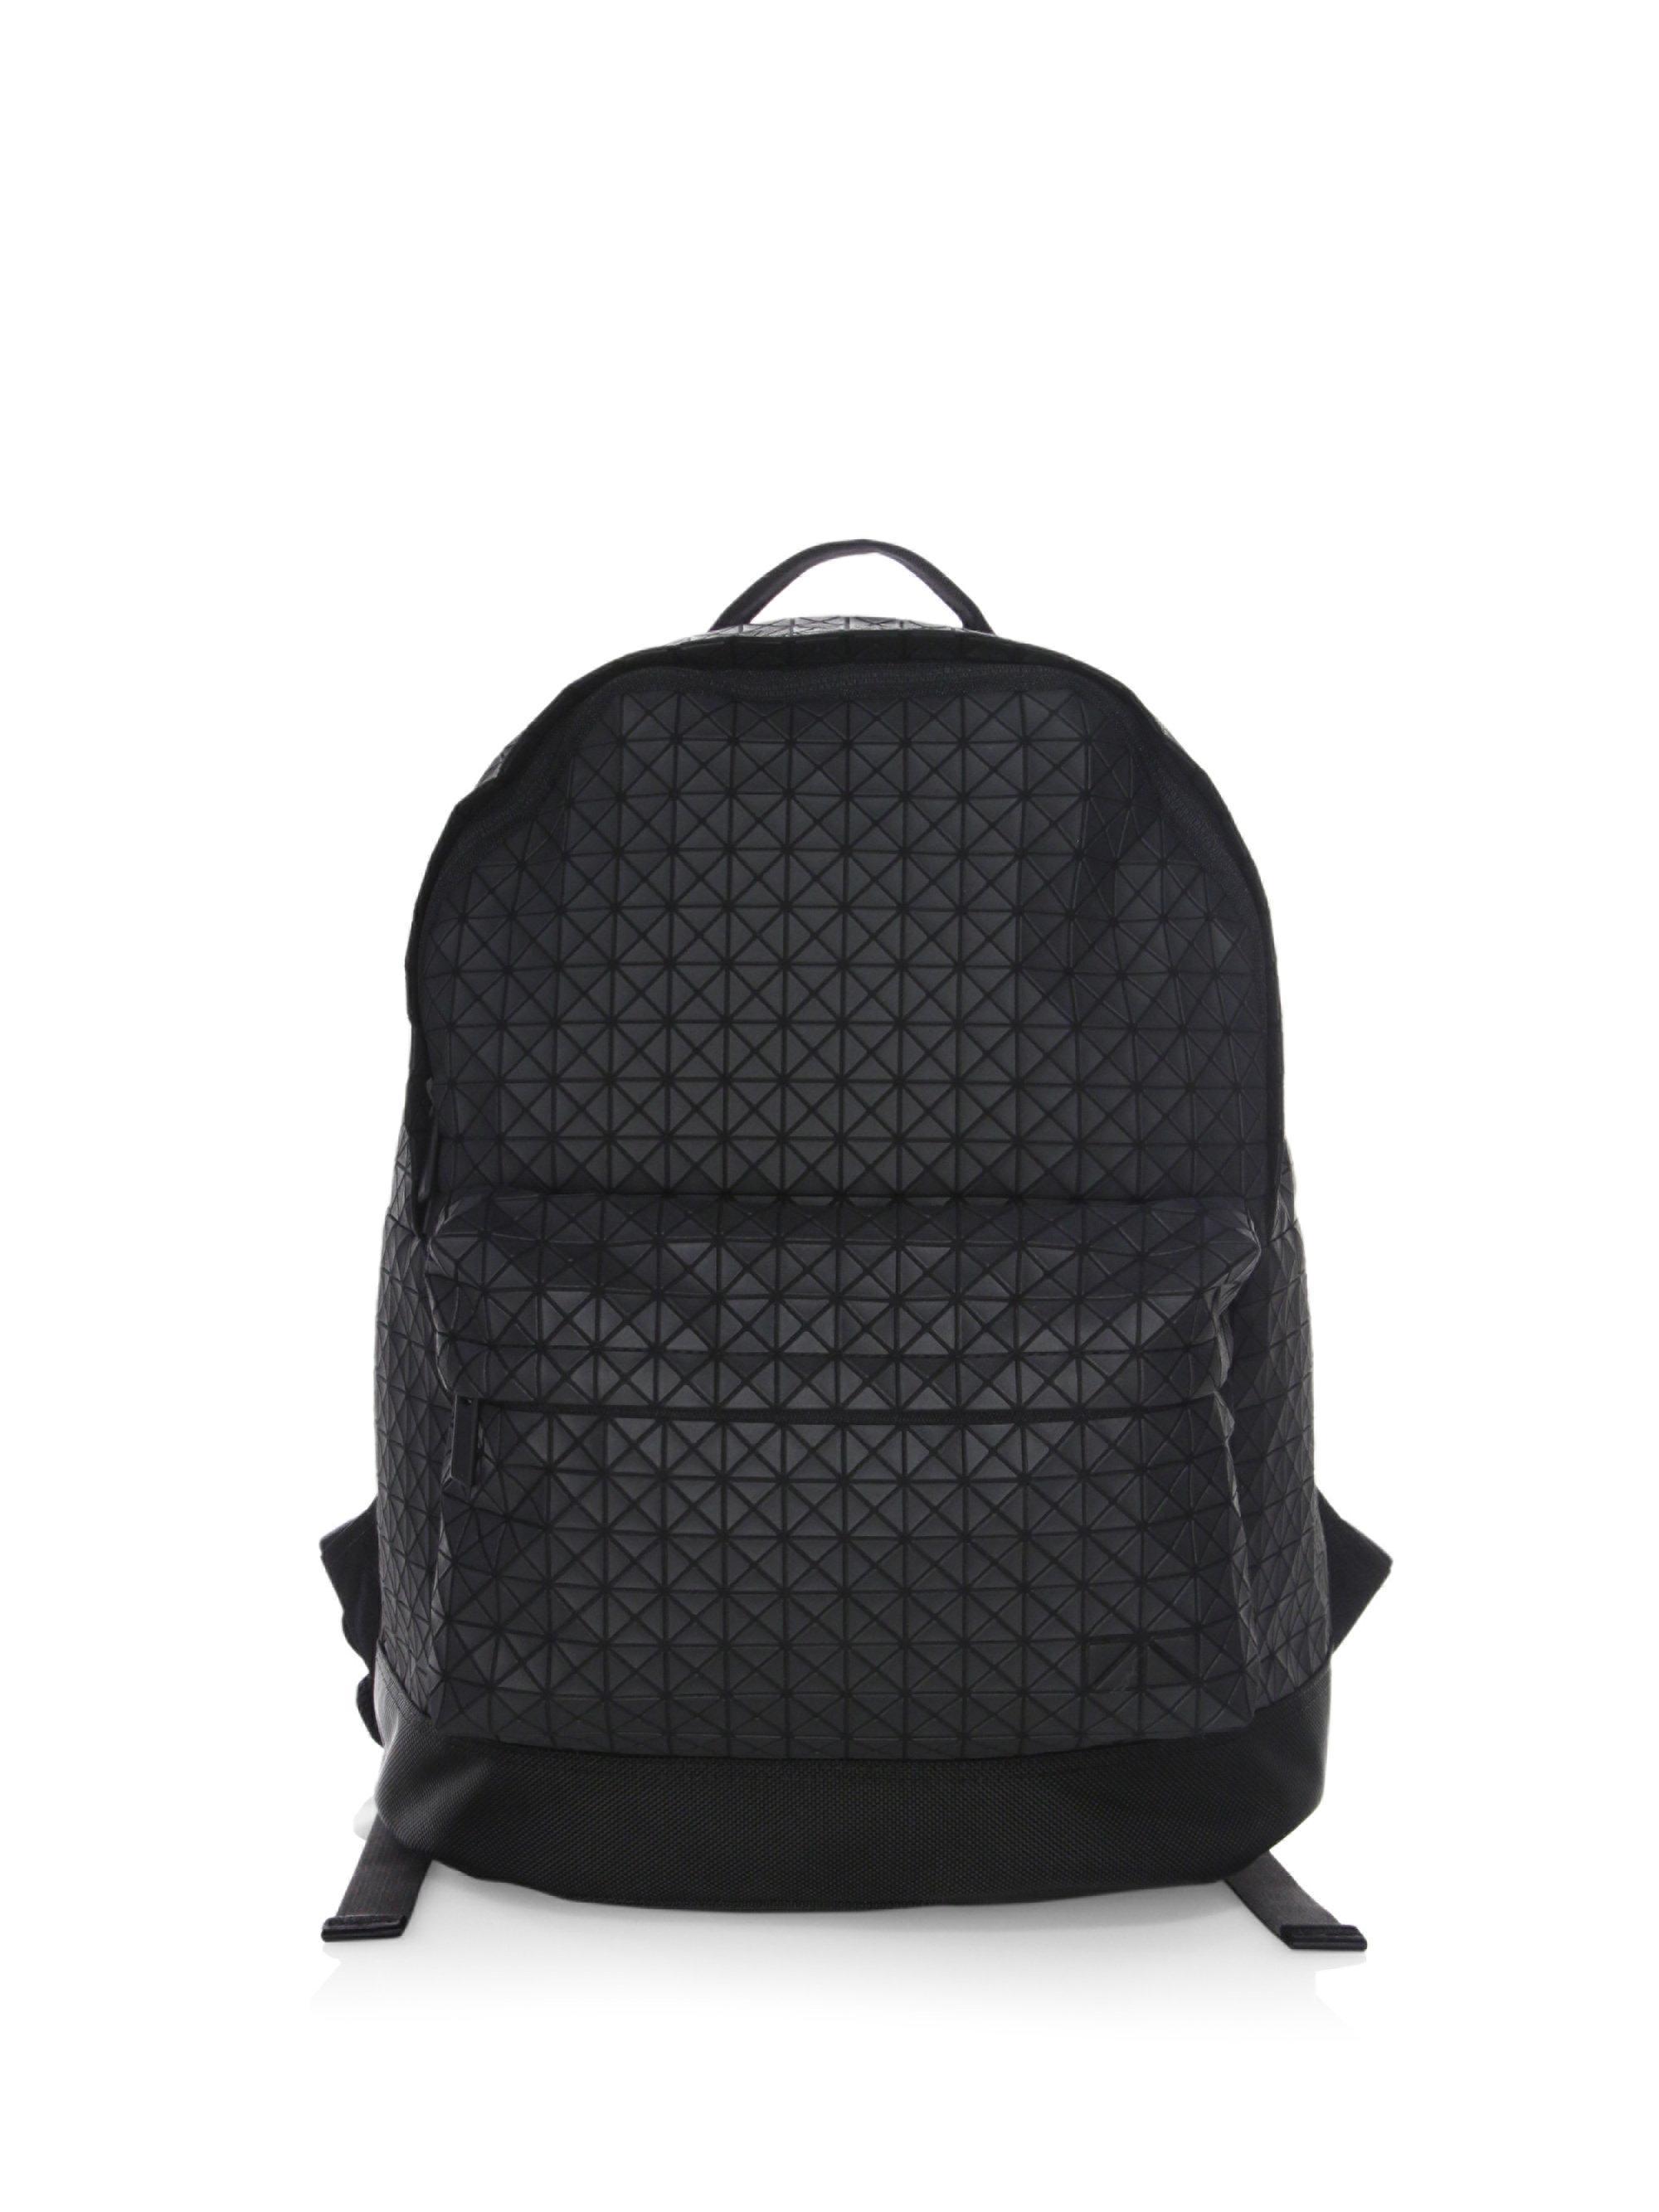 159549ef624 ... Bao Bao Issey Miyake. Mens Black Geometric Daypack Backpack sale  retailer e182d 92668 ...